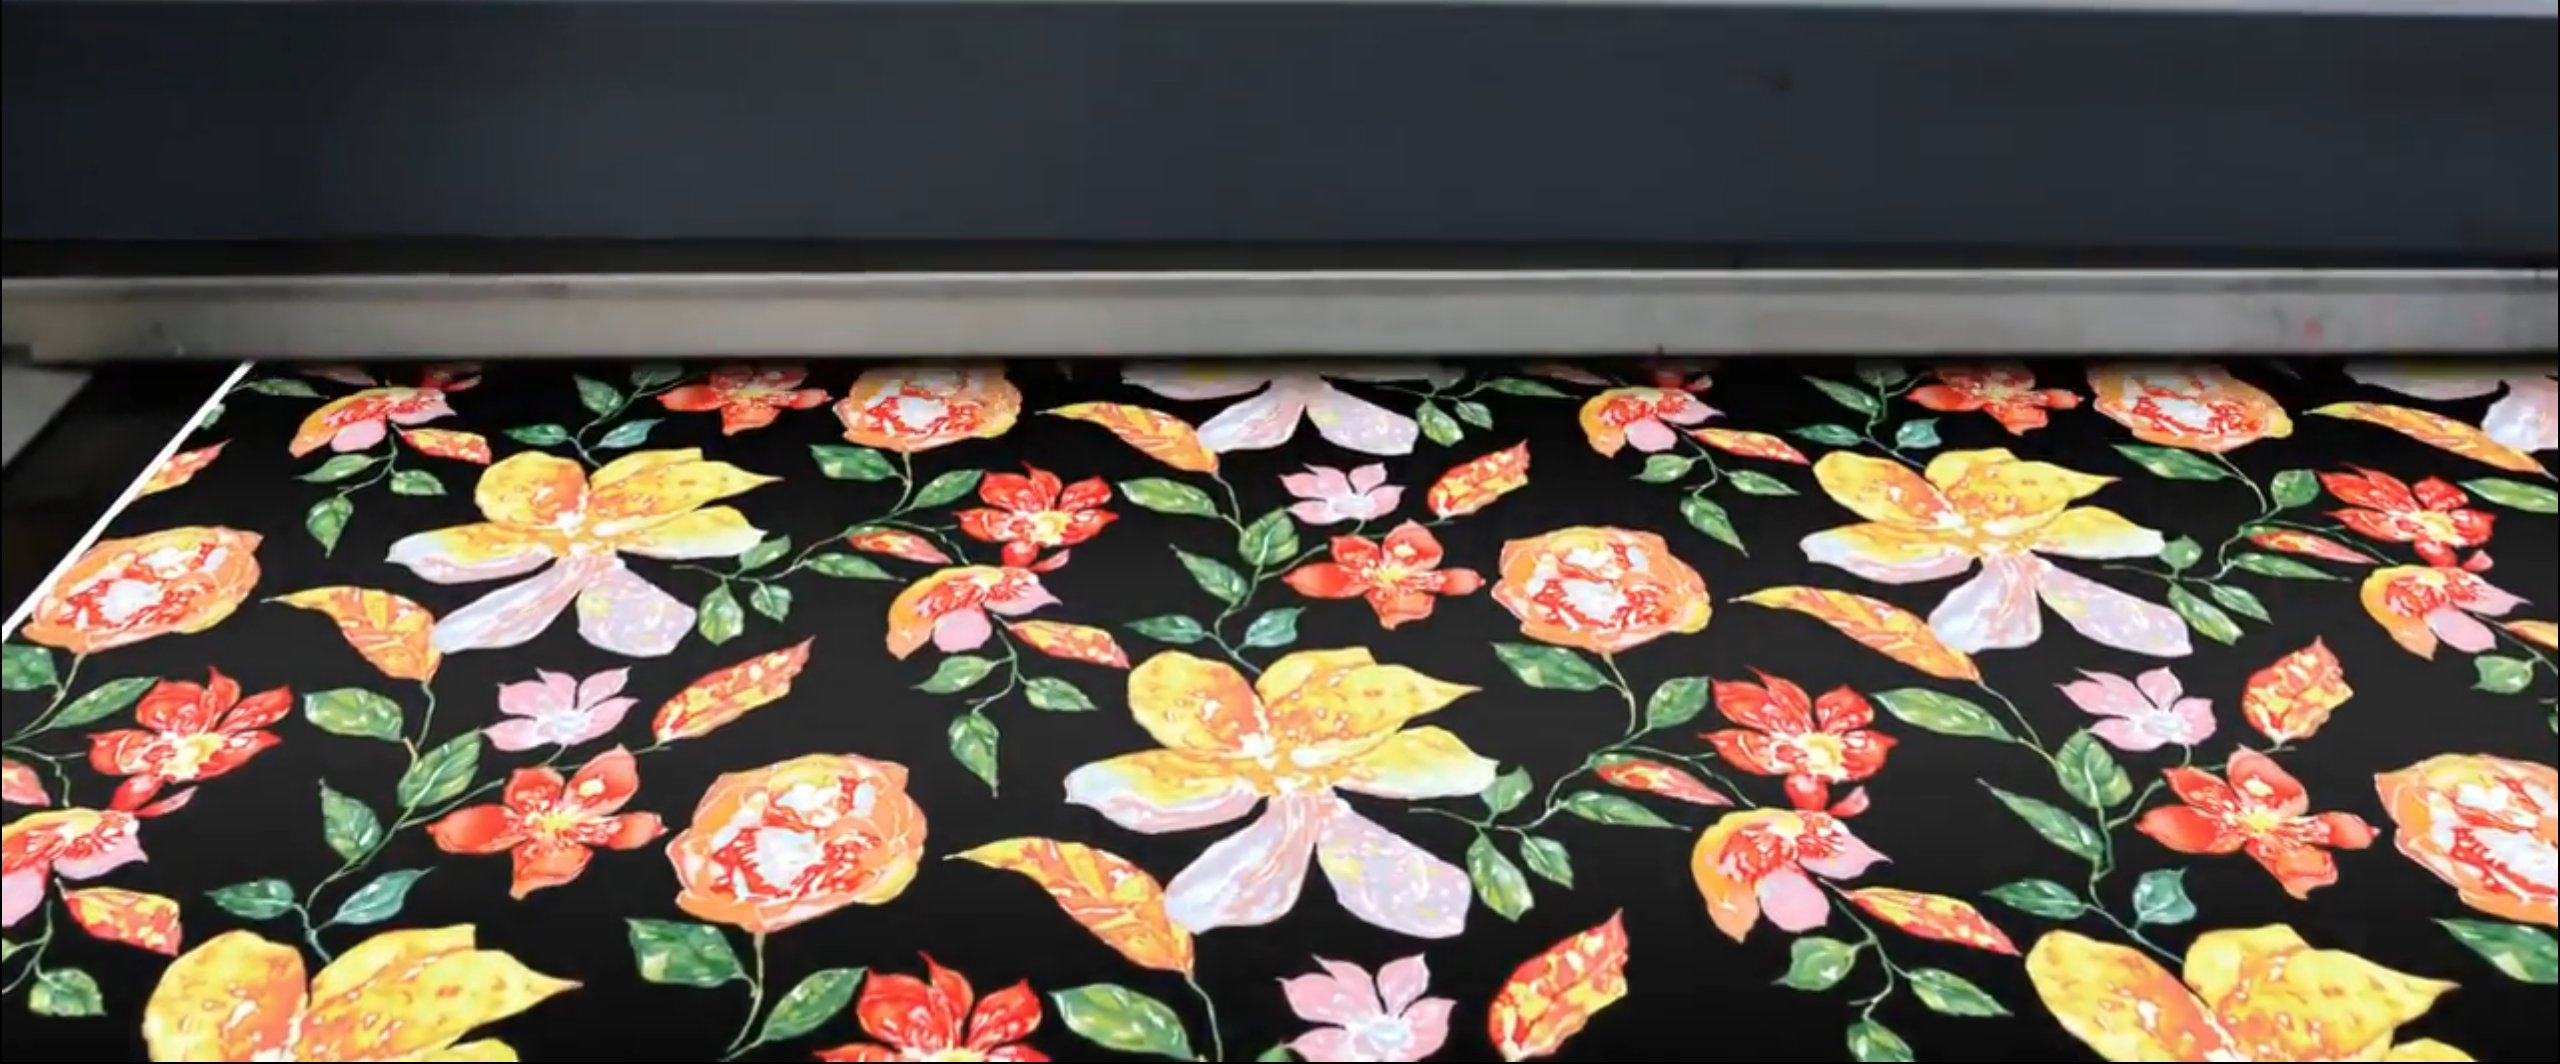 Digital textile printing design